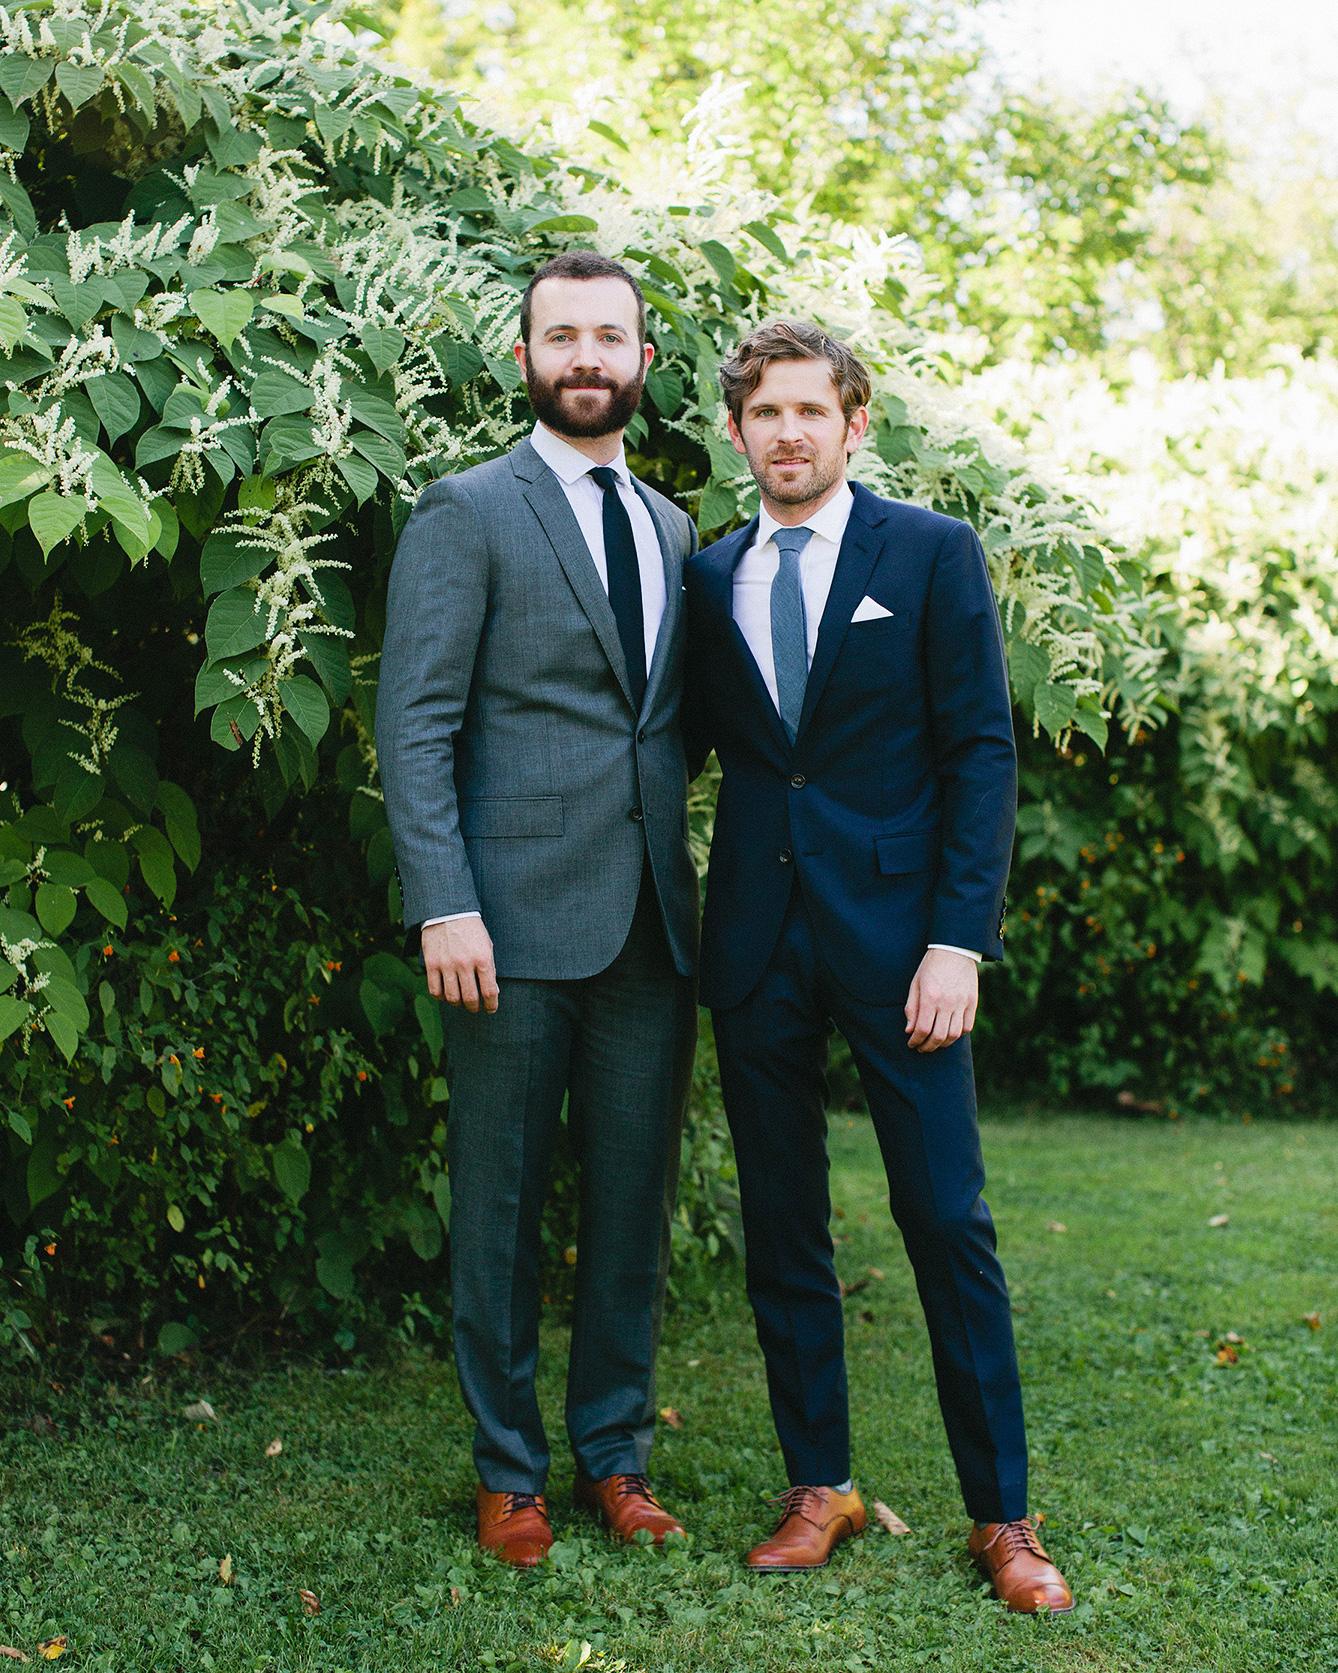 jesse-nate-wedding-couple-0334-s113063-0716.jpg